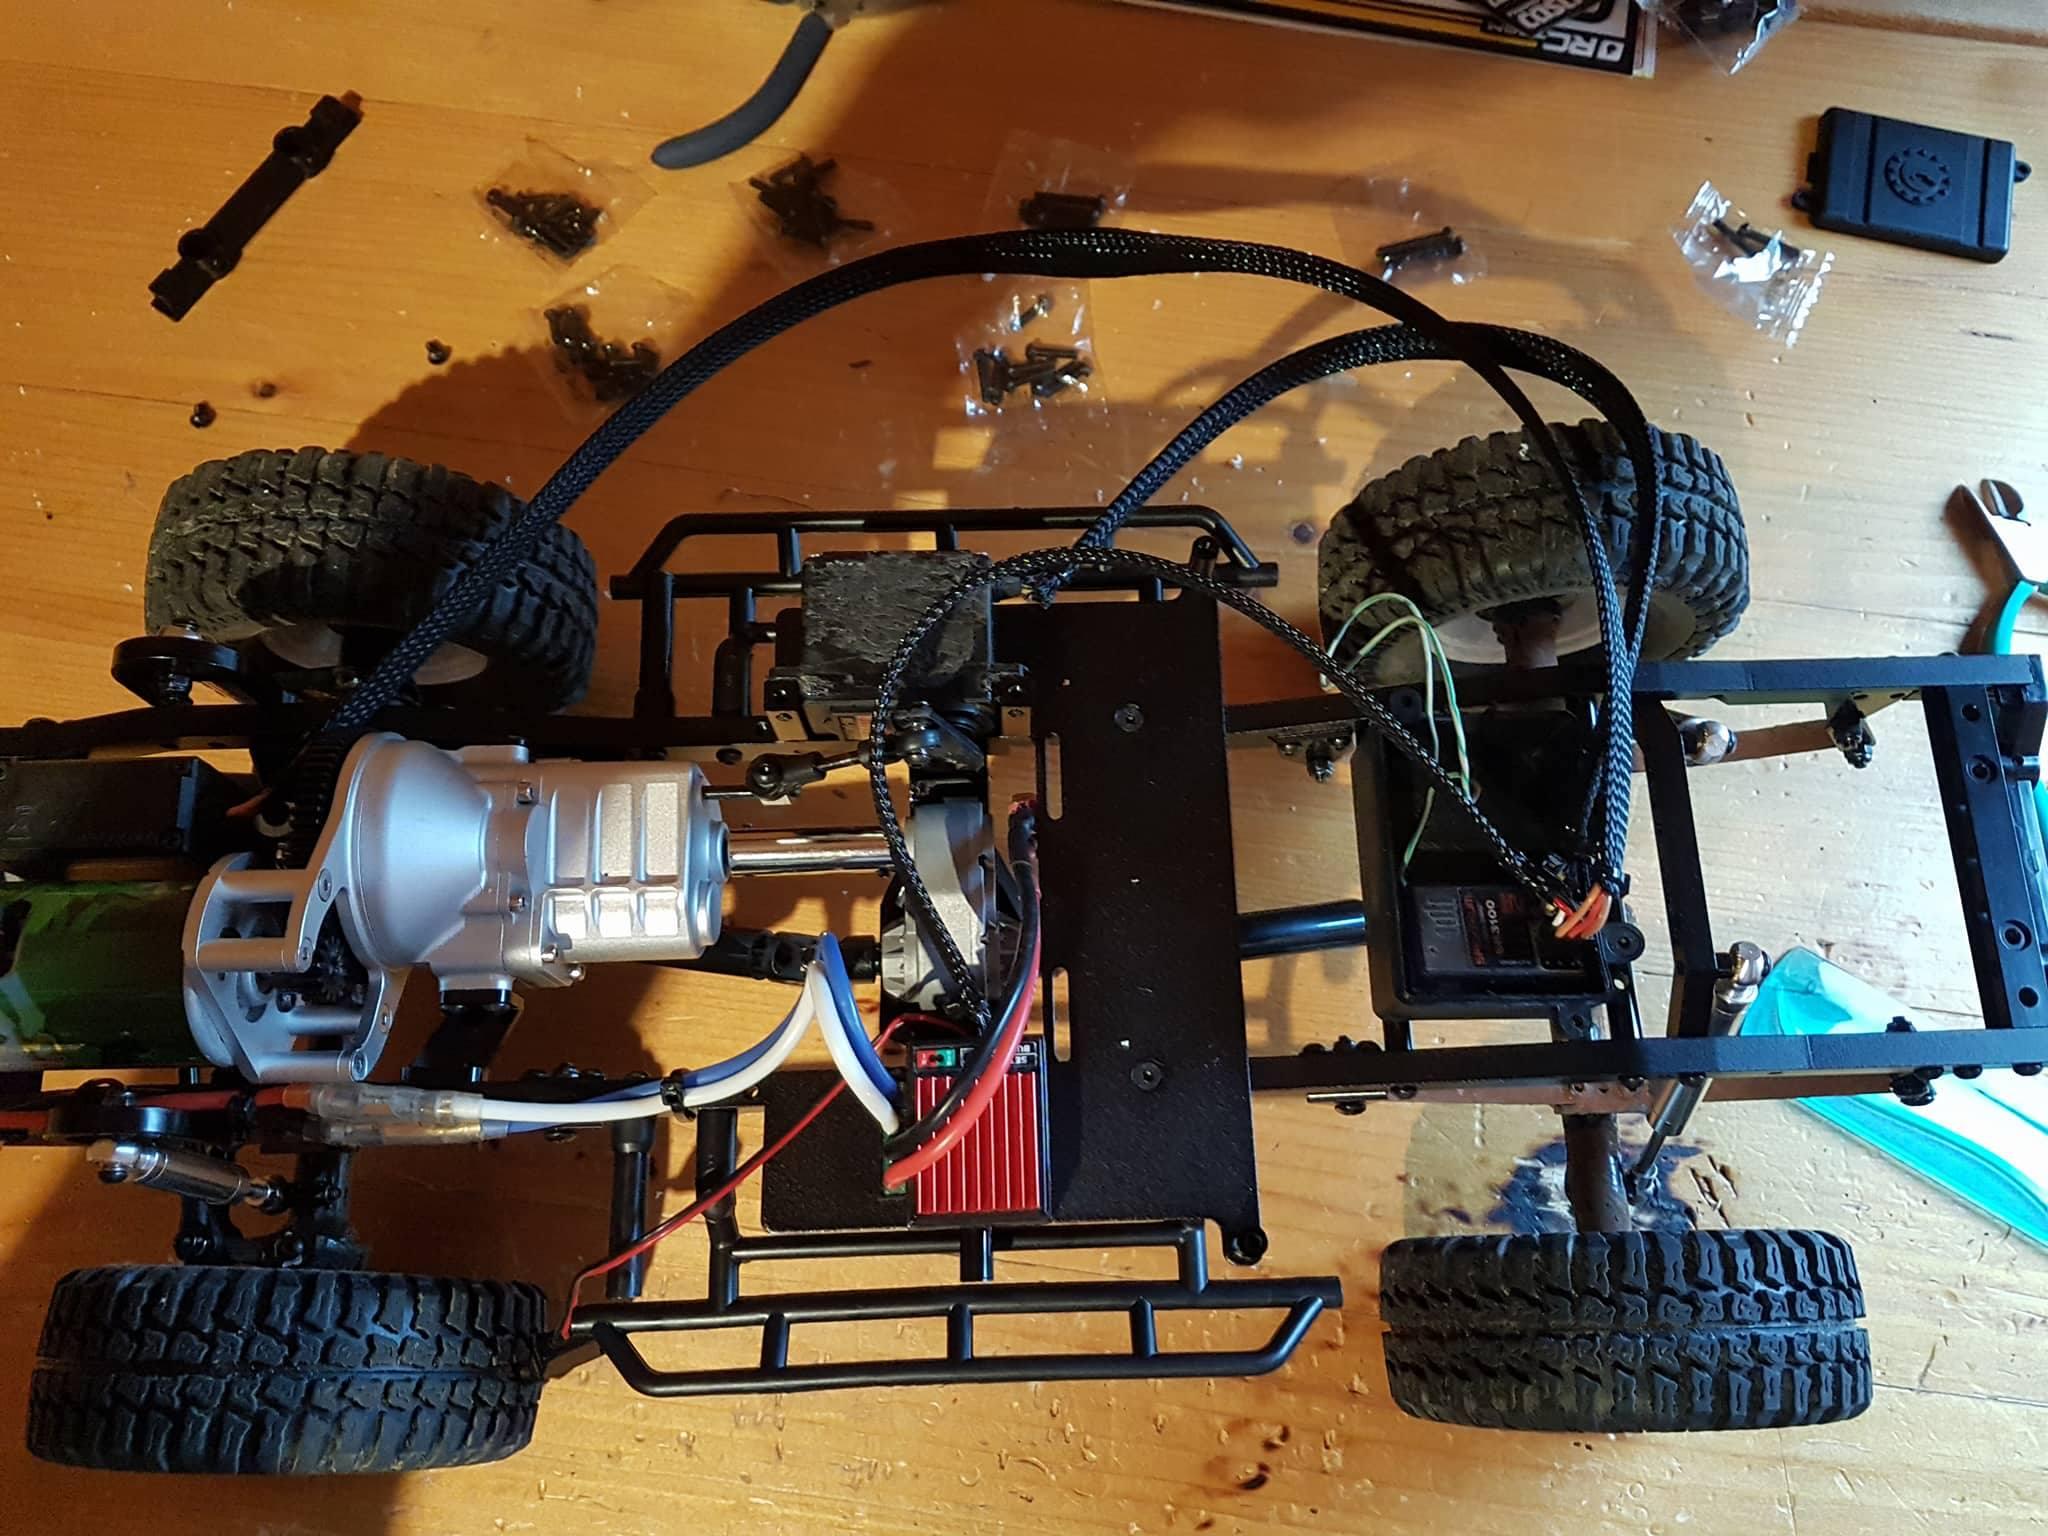 Farm Truck Chevrolet Blazer K5 sur TF2, Road Trip ! 322778183390371261007727351101328659953o